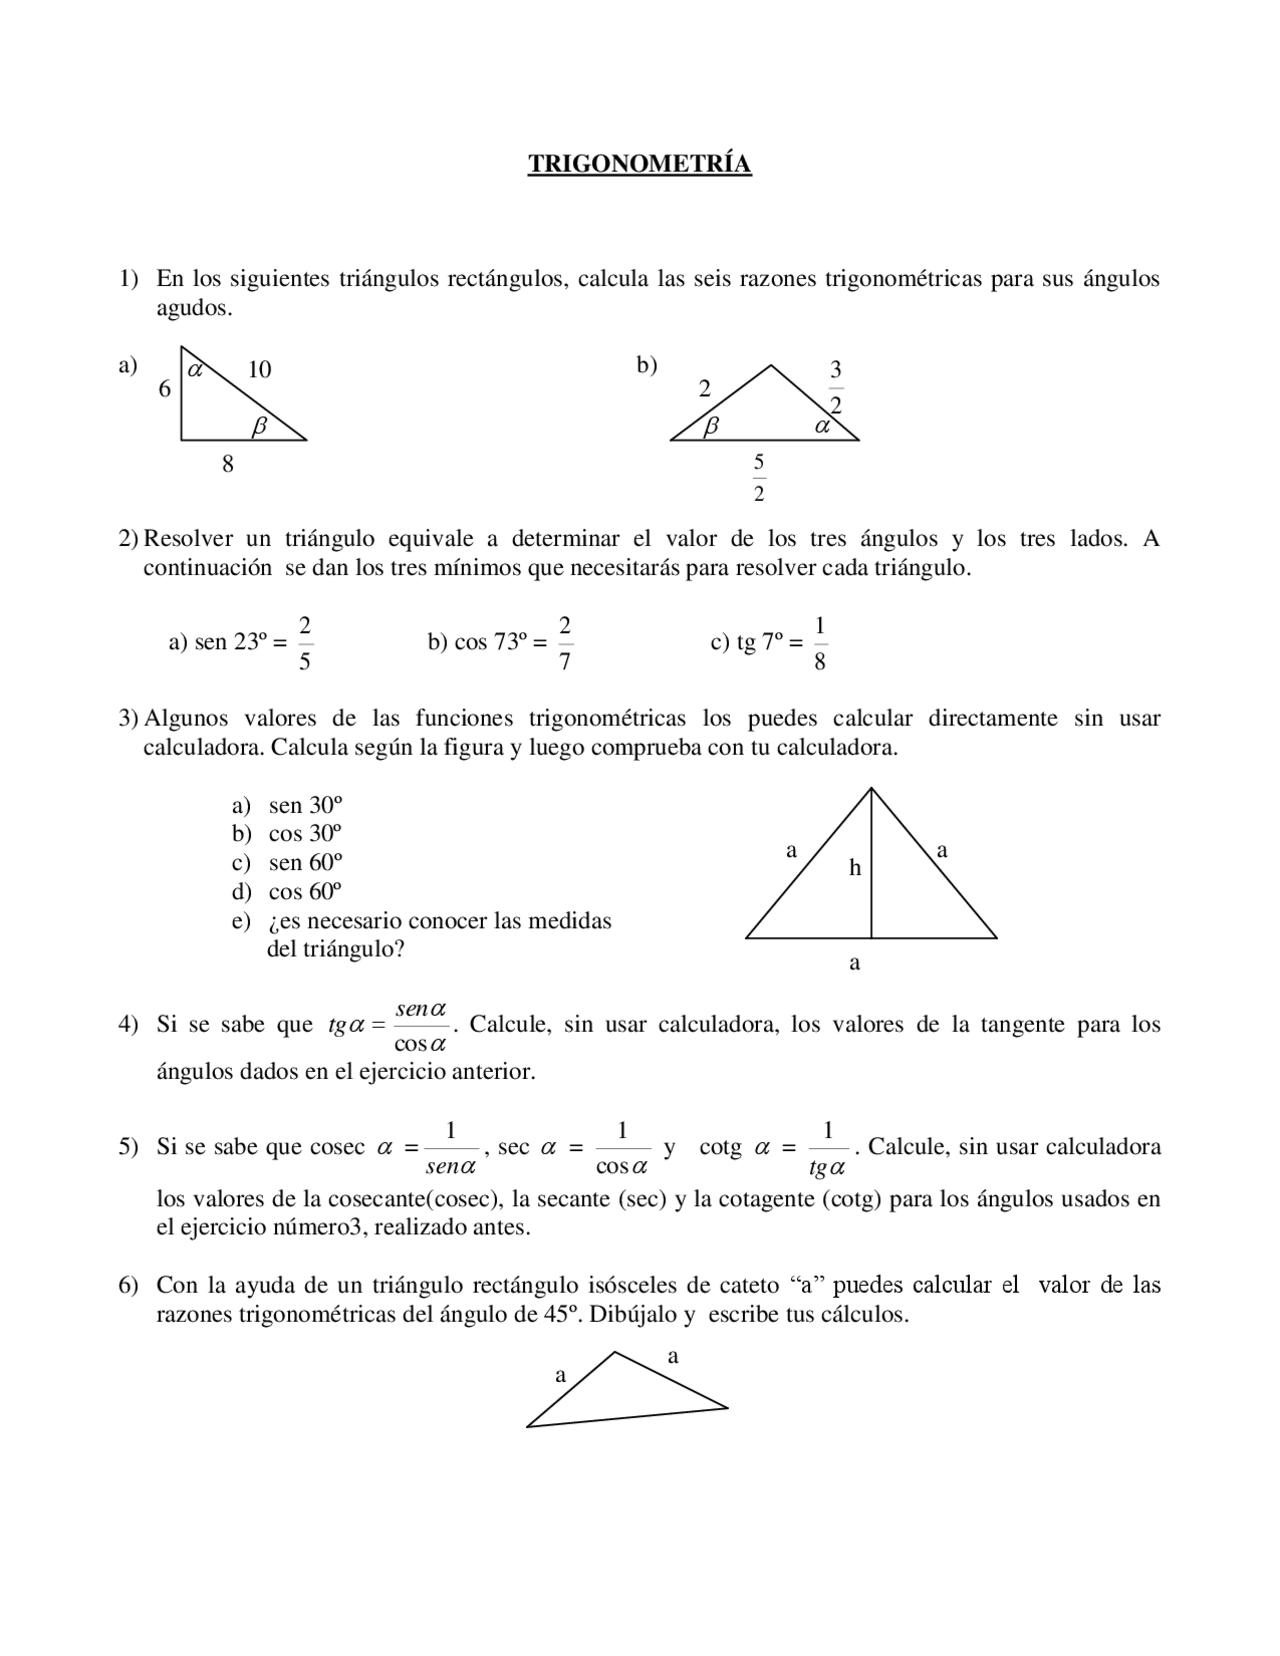 Trigonometria Ejercicios Grado Medio Docsity